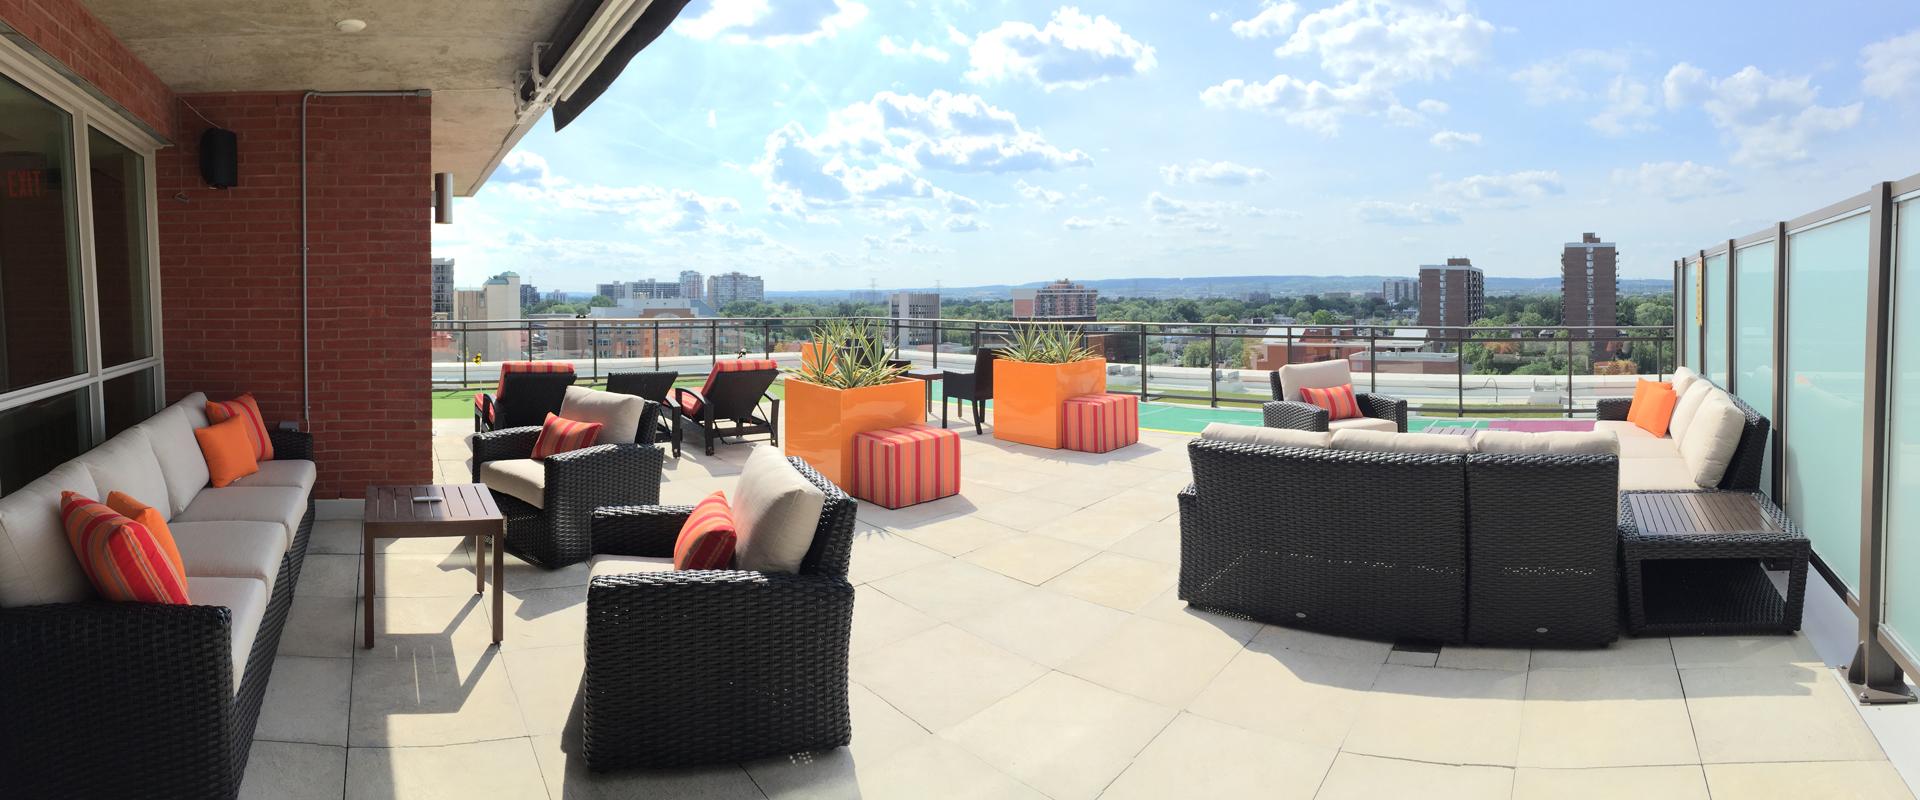 Luxury Pool And Spa Richmond Va